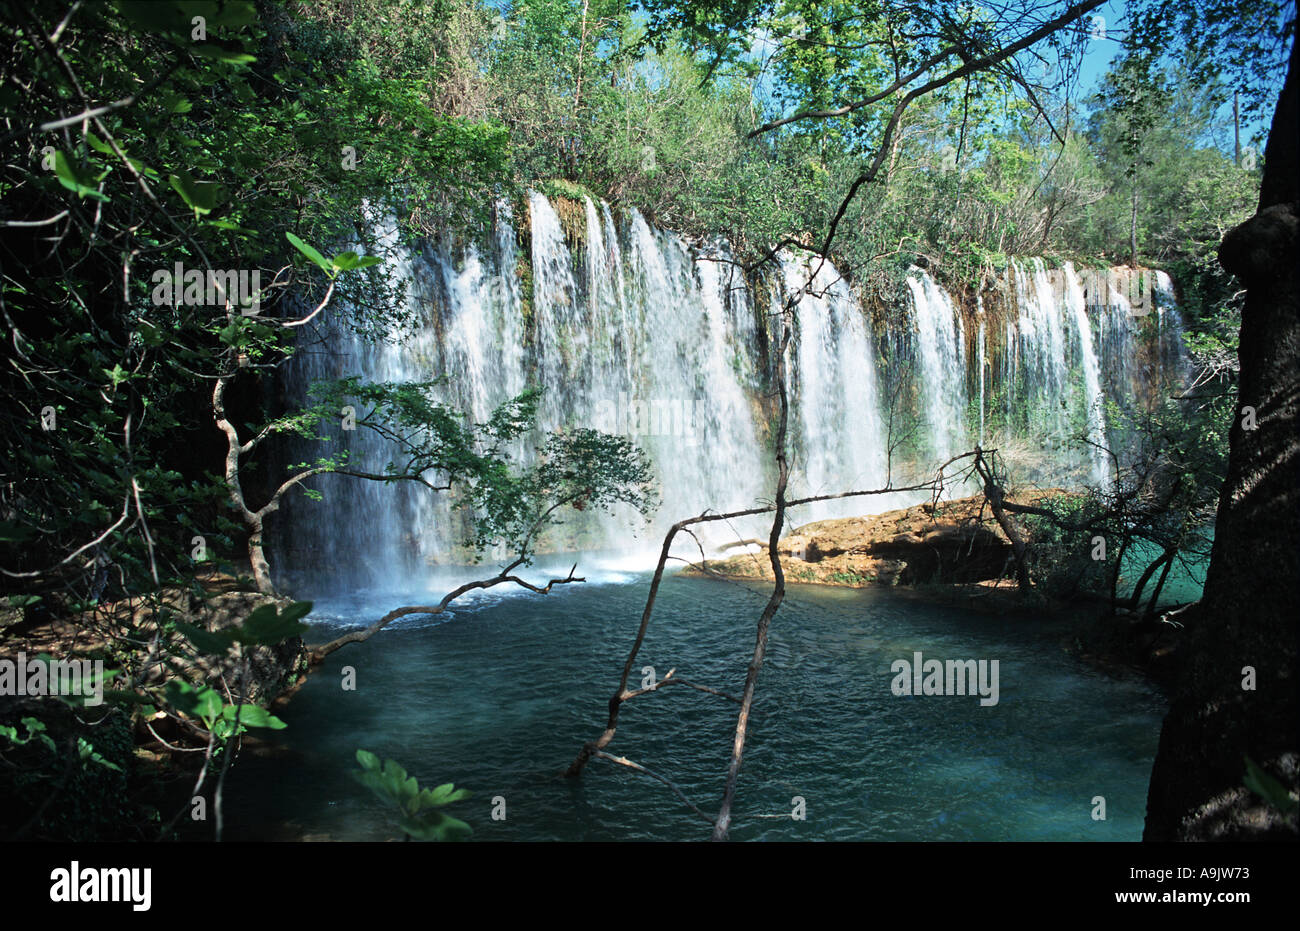 Termossos Duden waterfalls near Antakya Turkey - Stock Image